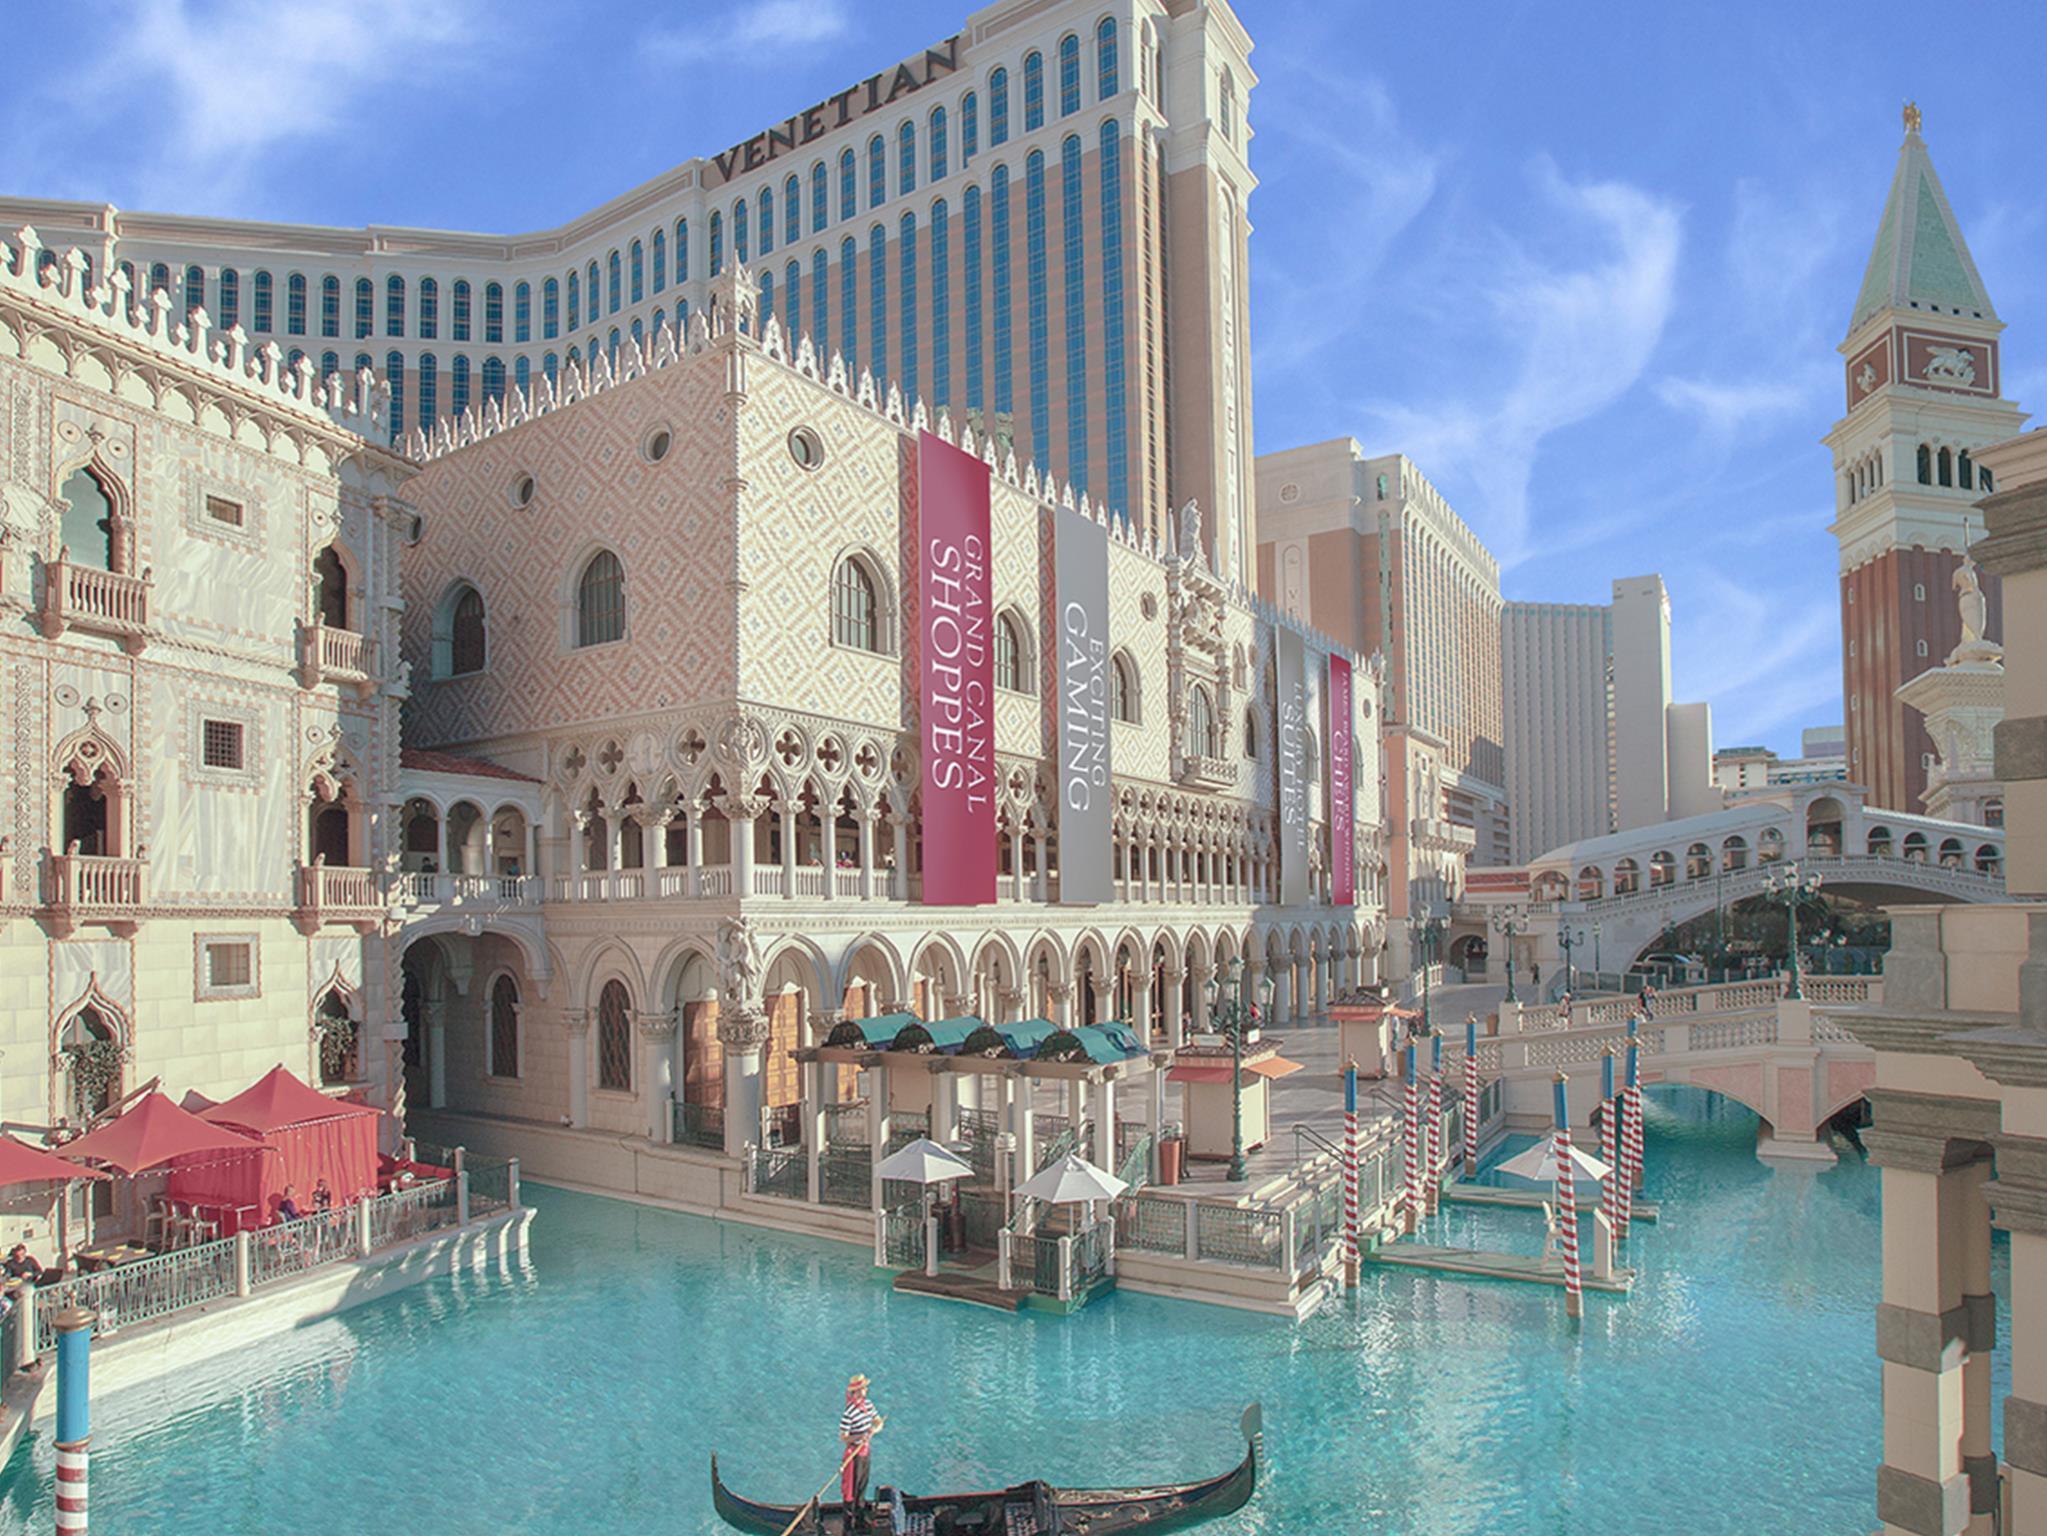 Las vegas venetian hotel casino minecraft server slots calculator